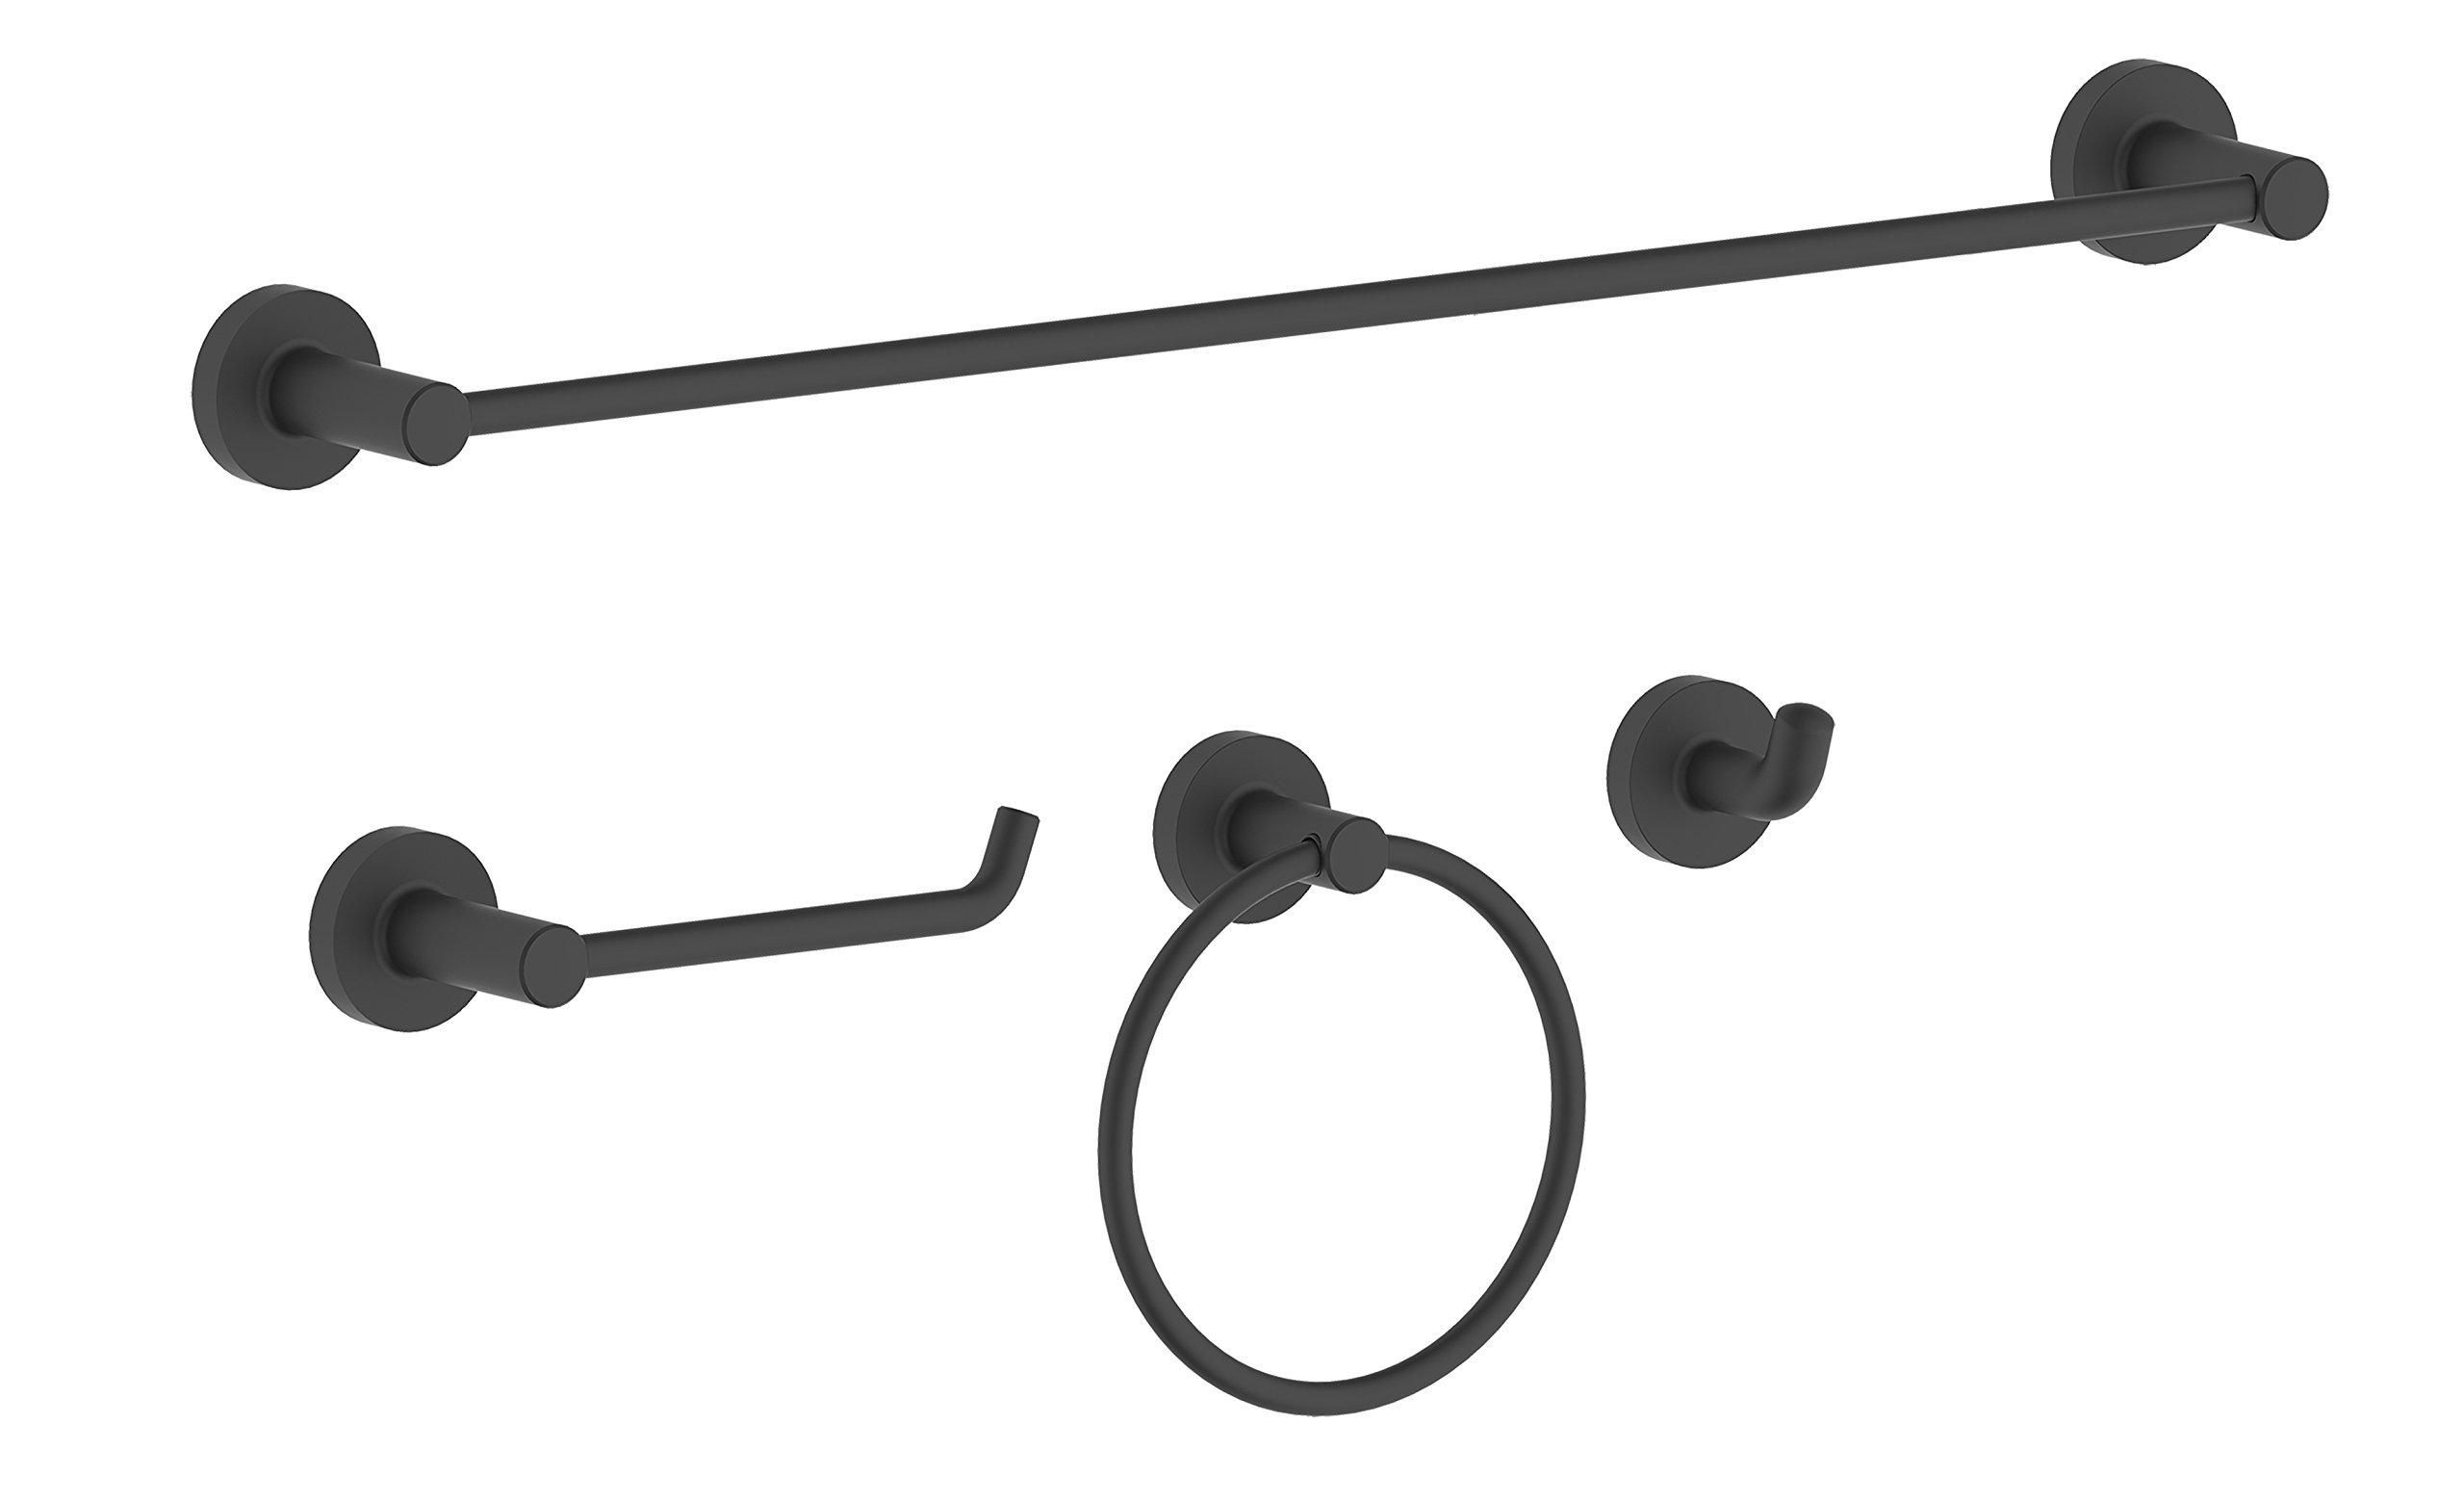 Serenade SBA01-MB 4 Pieces Bath Hardware Accessories Set with 24'' Towel Bar-Towel Ring- Paper Holder-Robe Hook, Matte Black